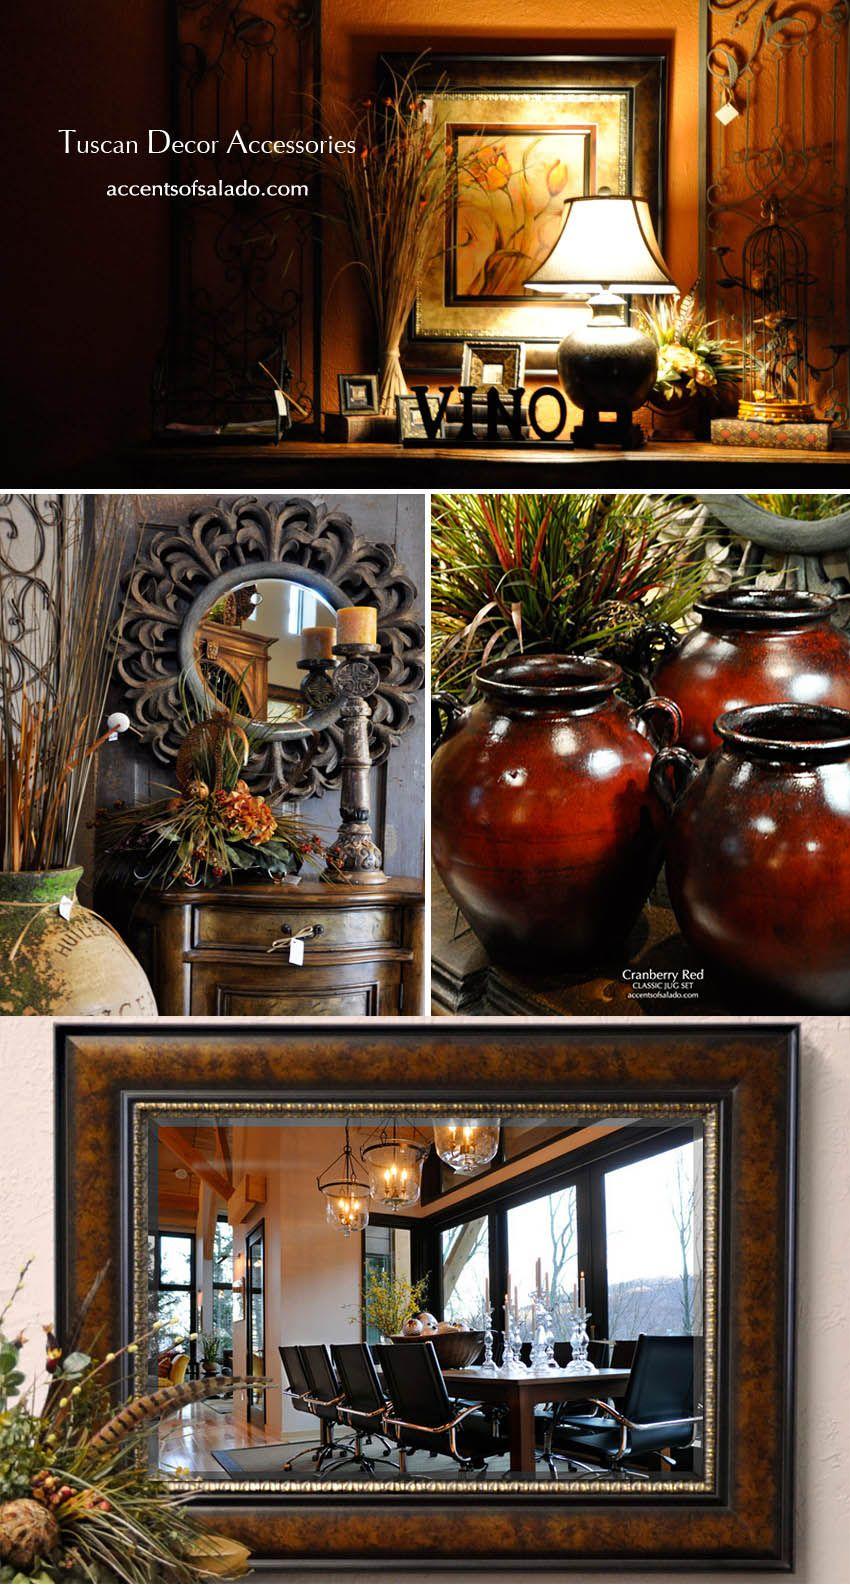 Tuscan Decor Decorating Accessories Tuscan Decorating Tuscany Decor Tuscan Decorating Living Room